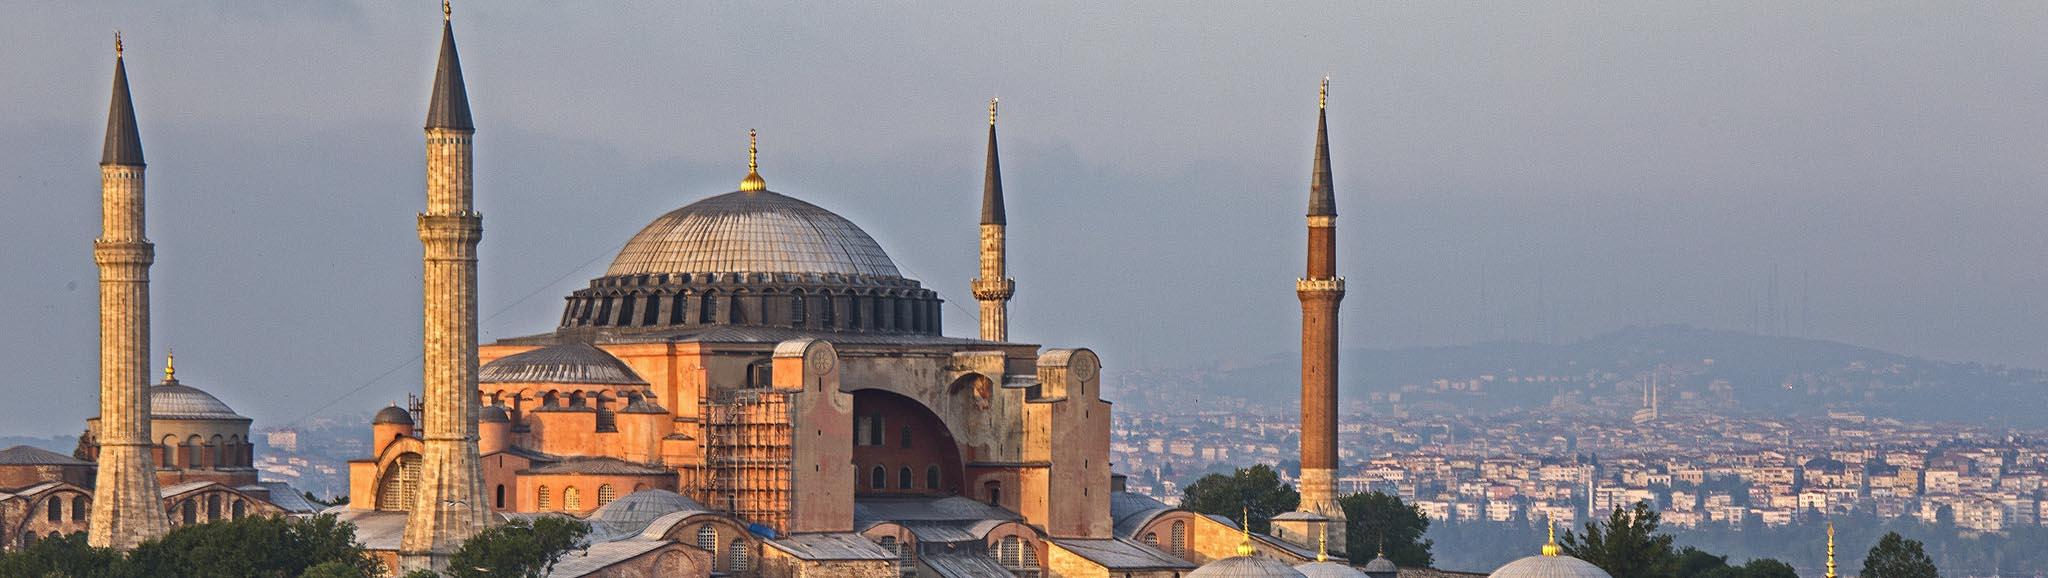 Собор Софии, Стамбул